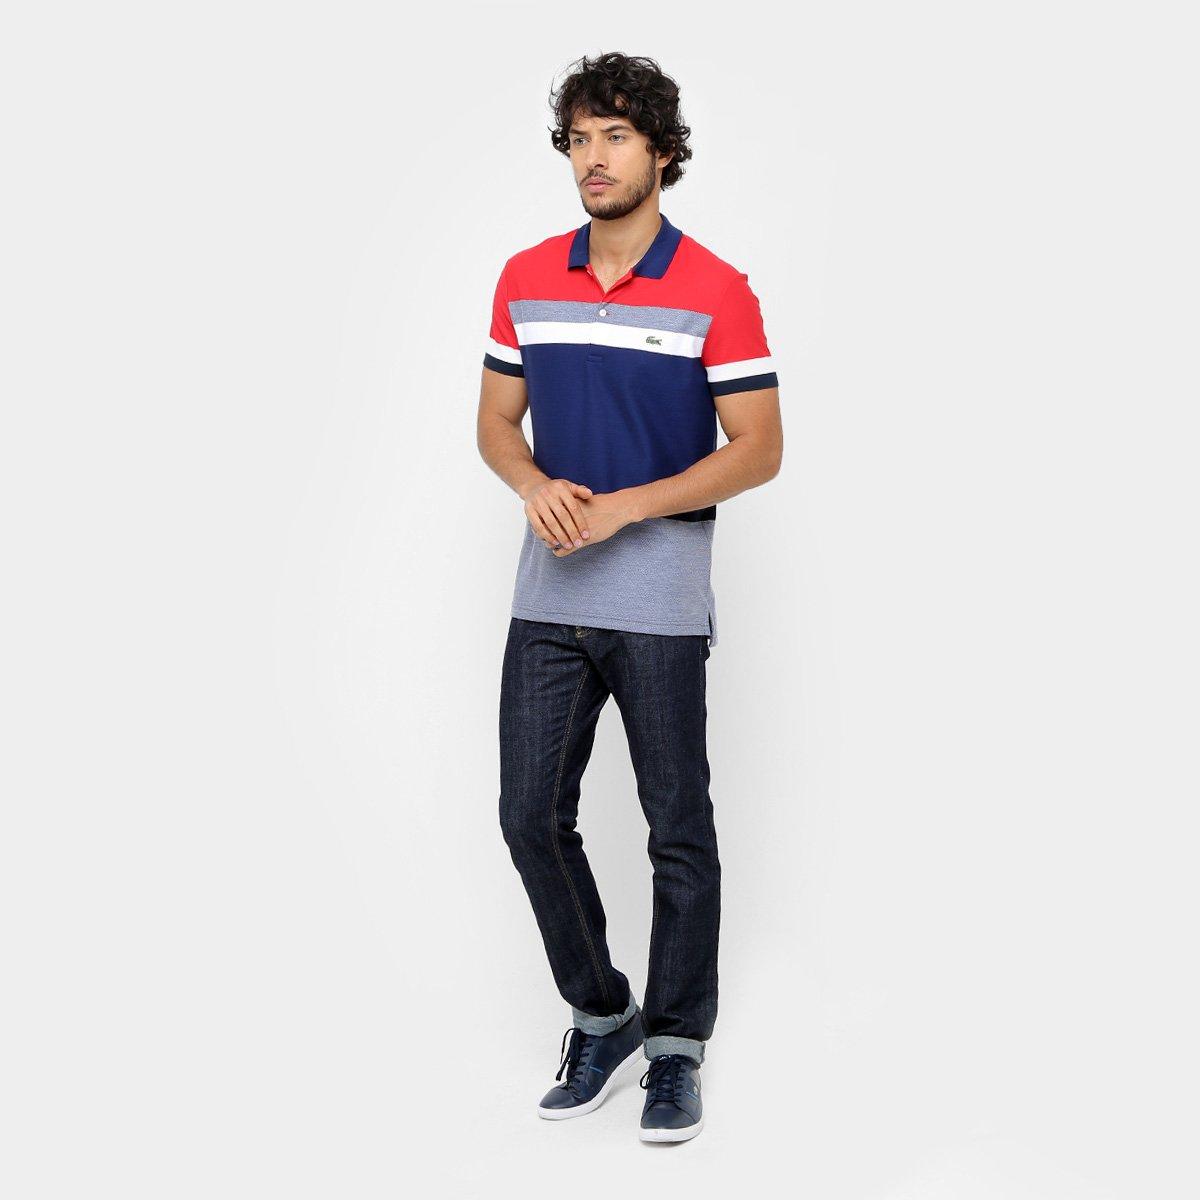 ab2d3b48da9 Camisa Polo Lacoste Piquet listras color - Compre Agora